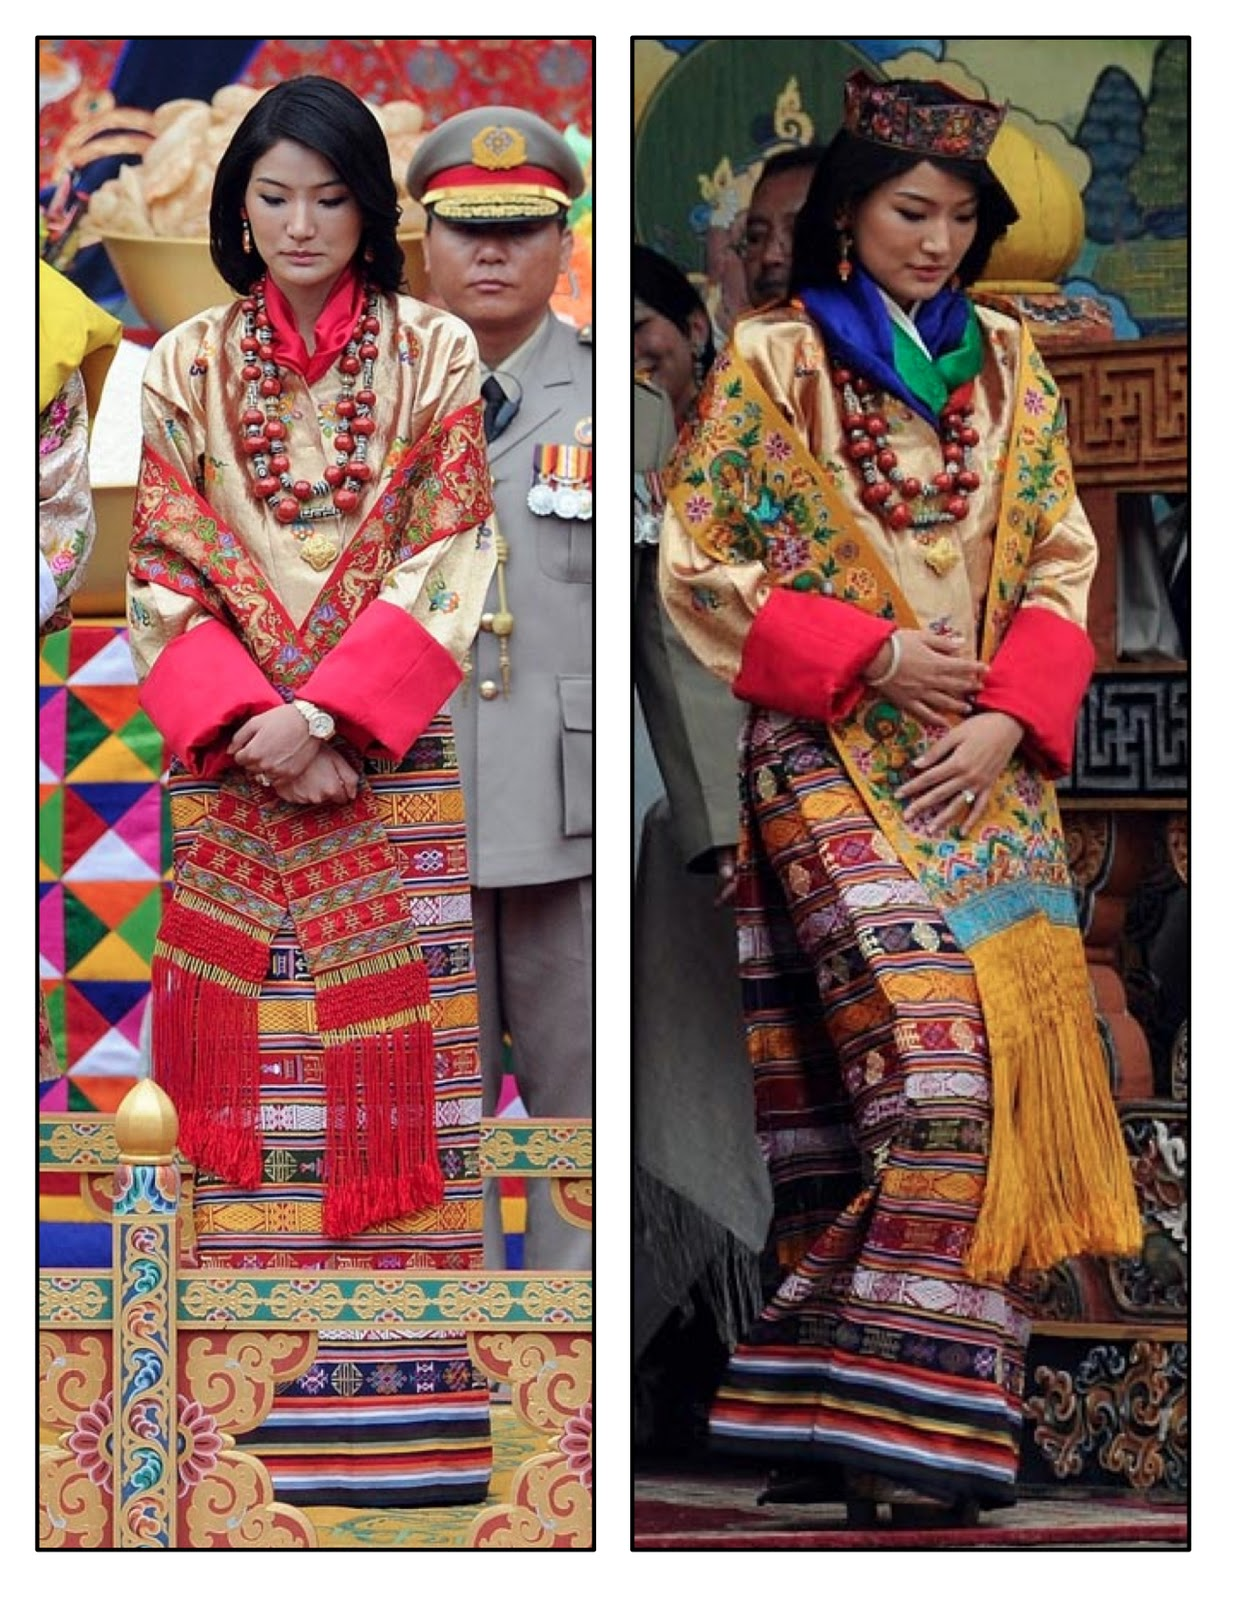 Queen Of Swords Tarot Art 16x20 Poster Print Psychedelic Gypsy: Green Tea: The King And Queen Of Bhutan's Wedding Outfits